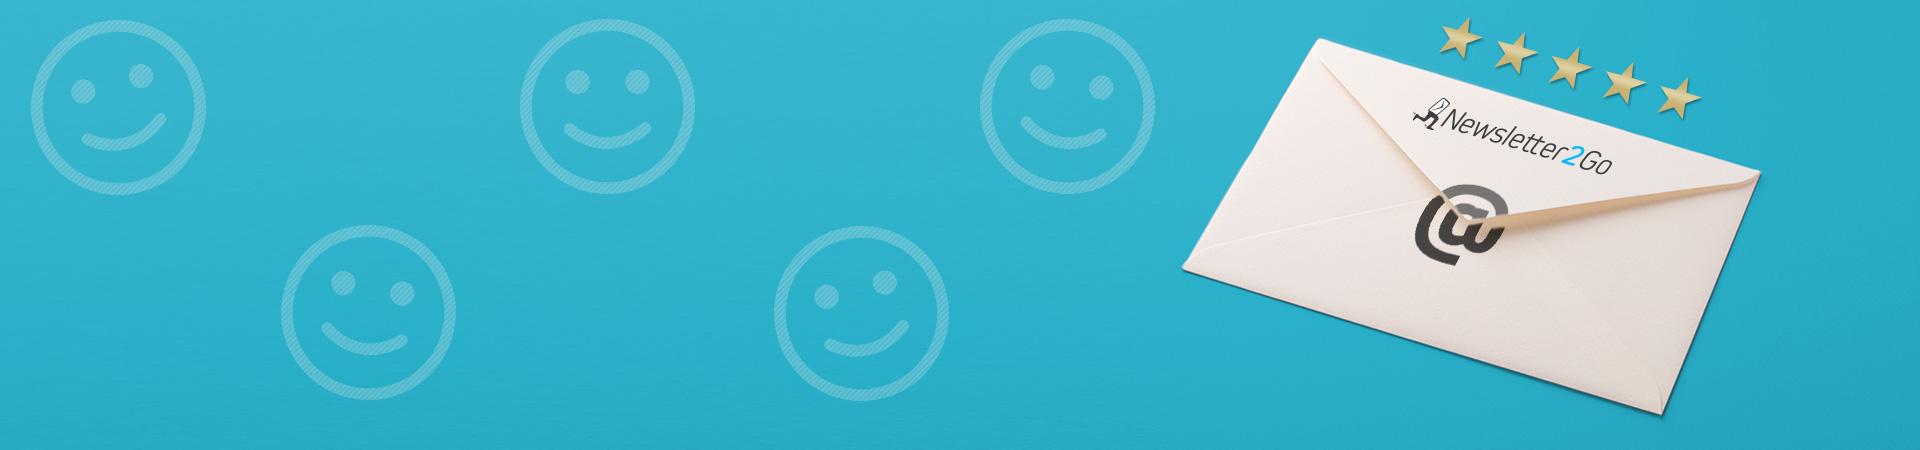 5 Tipps zur Kundenbindung im E-Mail-Marketing